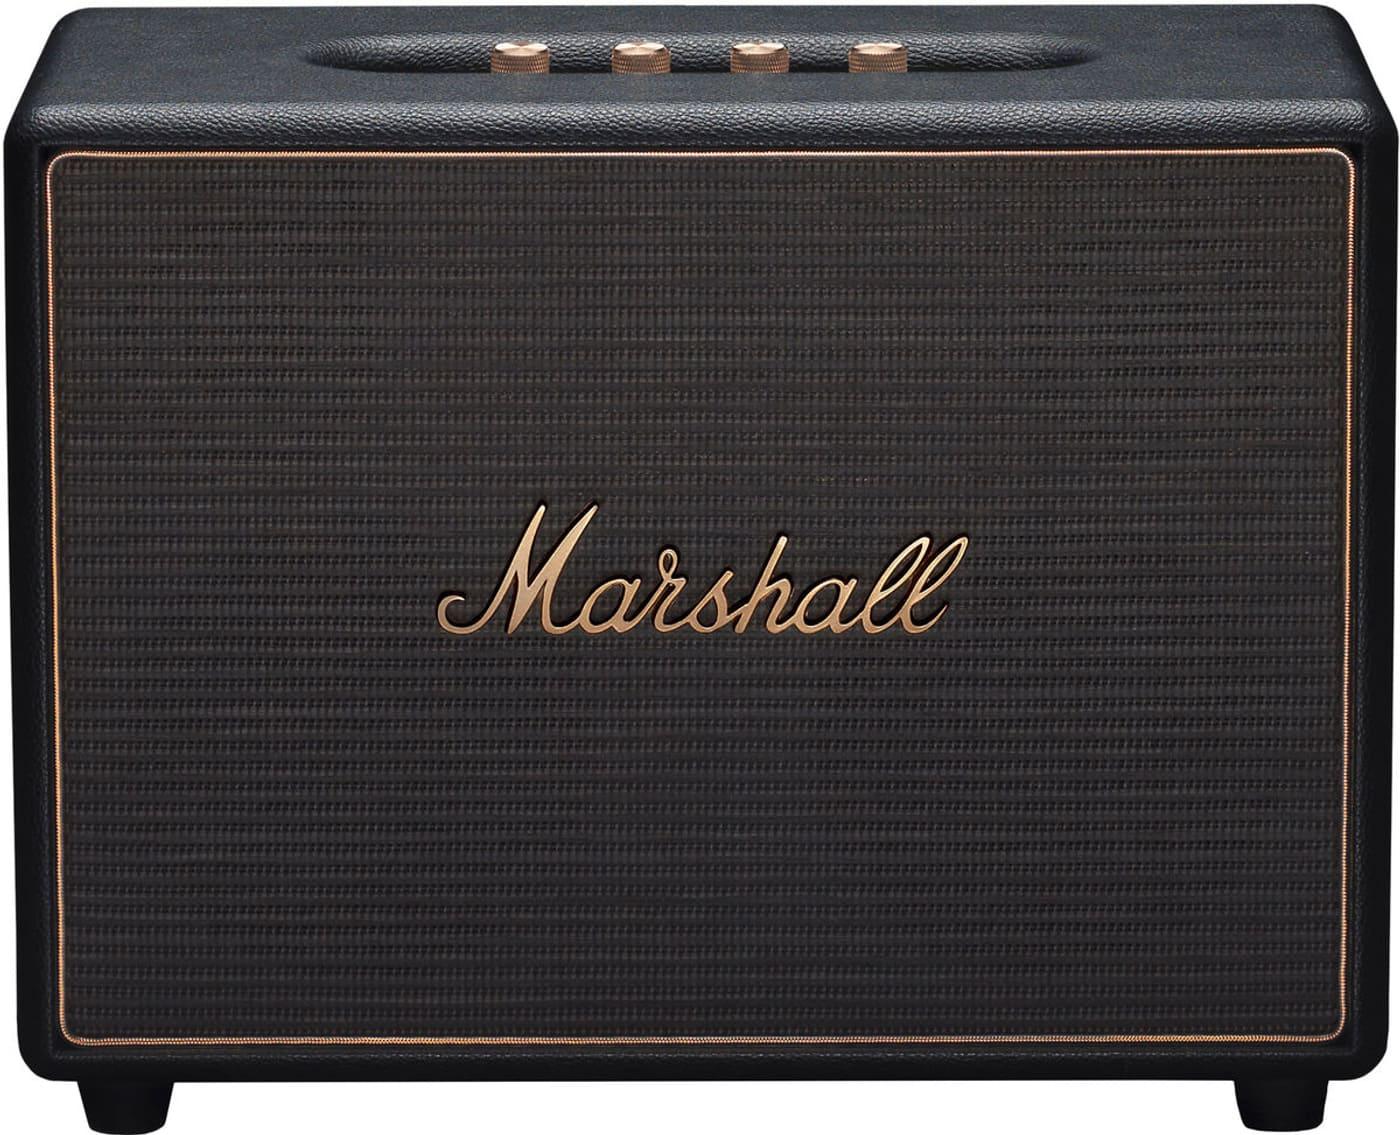 Marshall Woburn - Schwarz Multiroom Lautsprecher ... 9d6f824064294